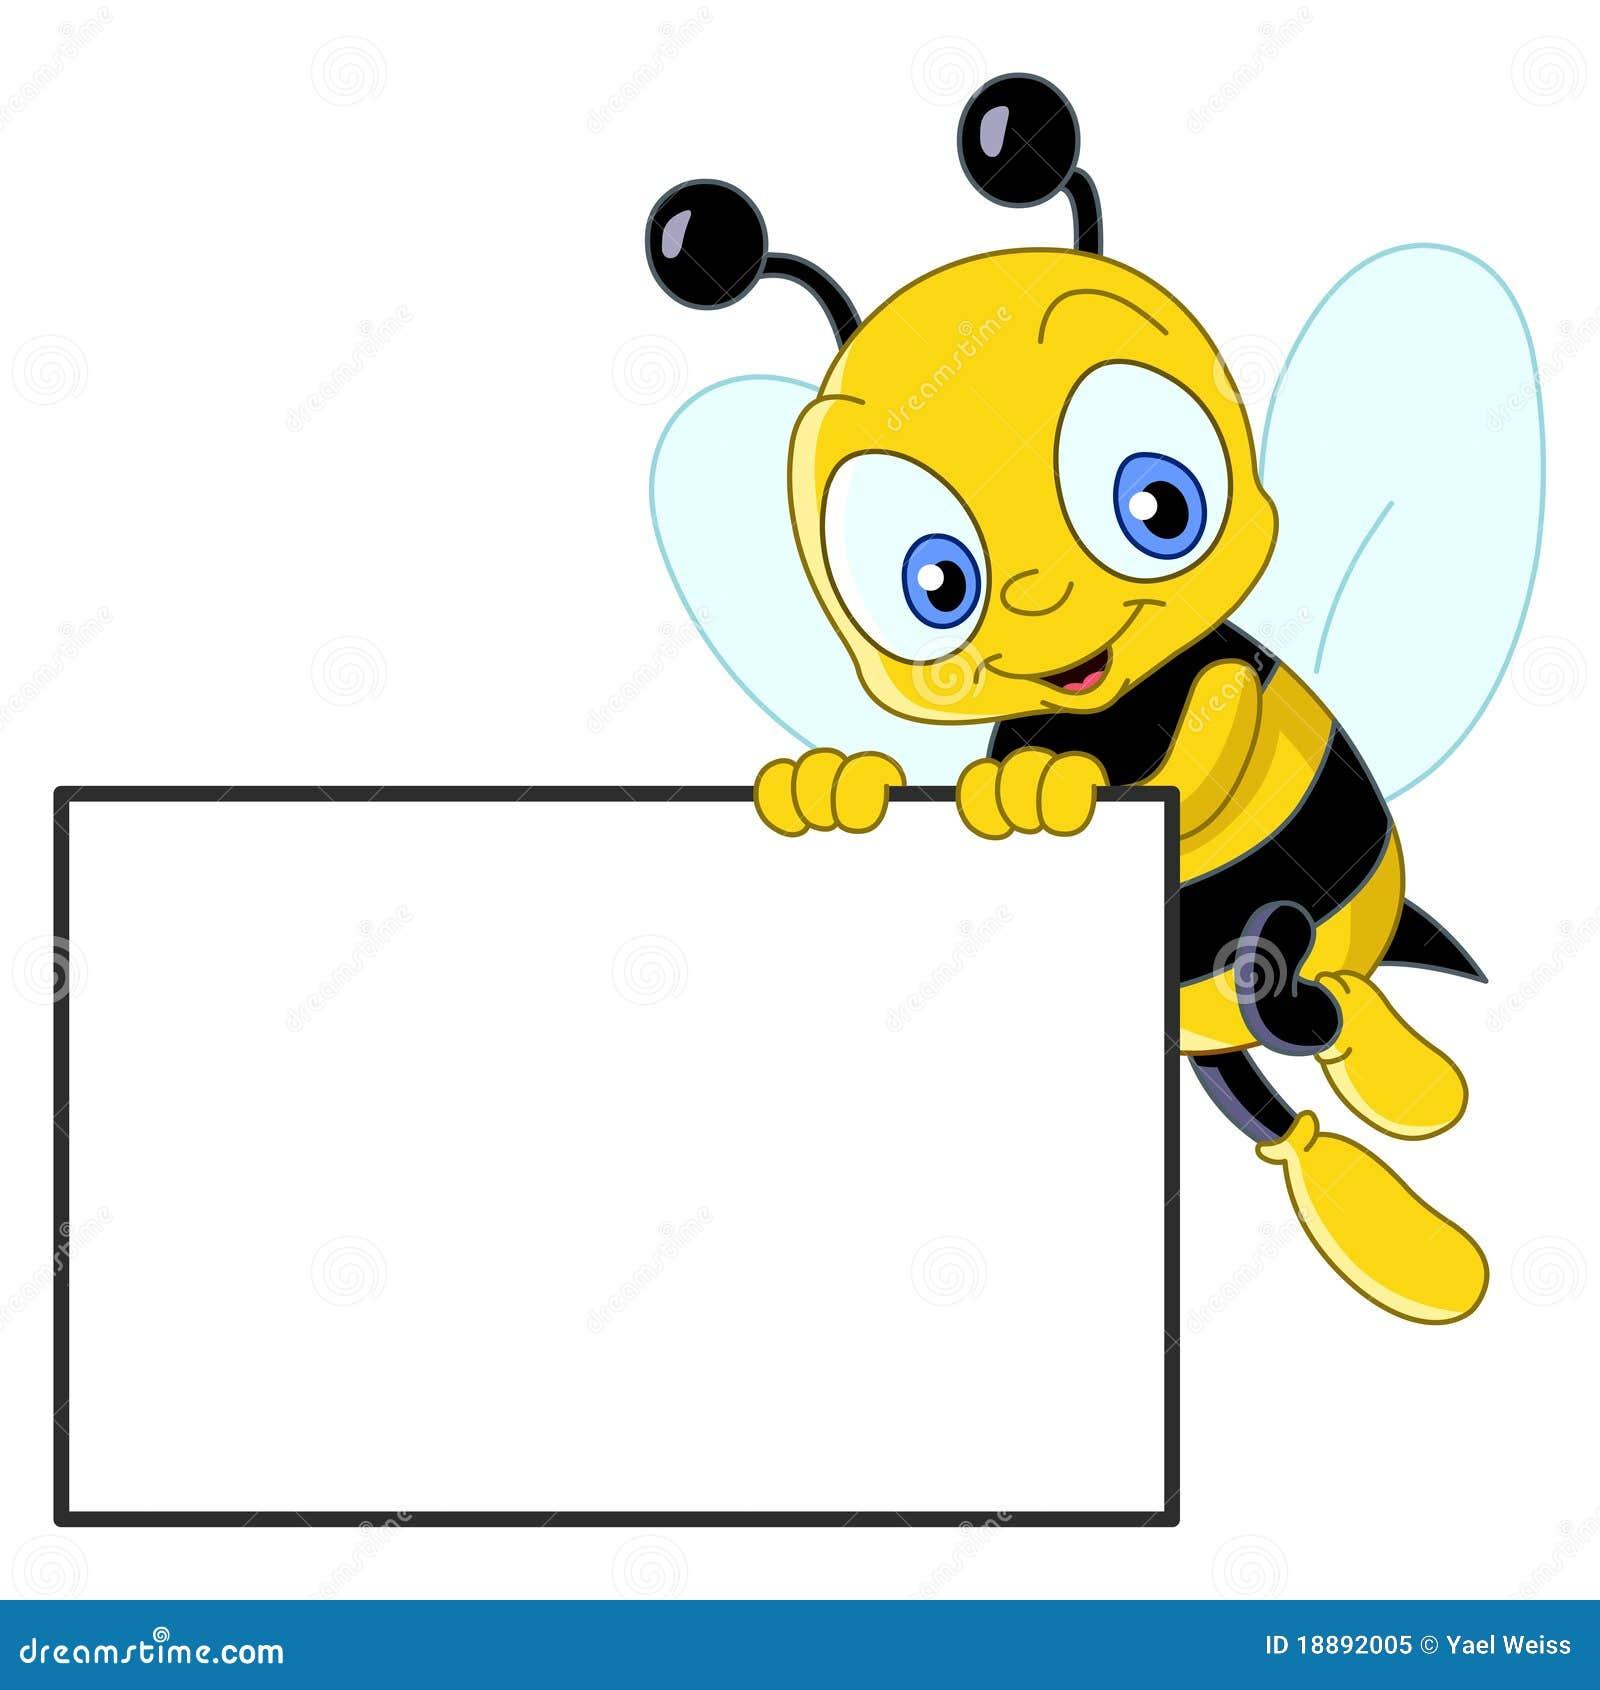 Bees Clipart Border Www Pixshark Com Images Galleries